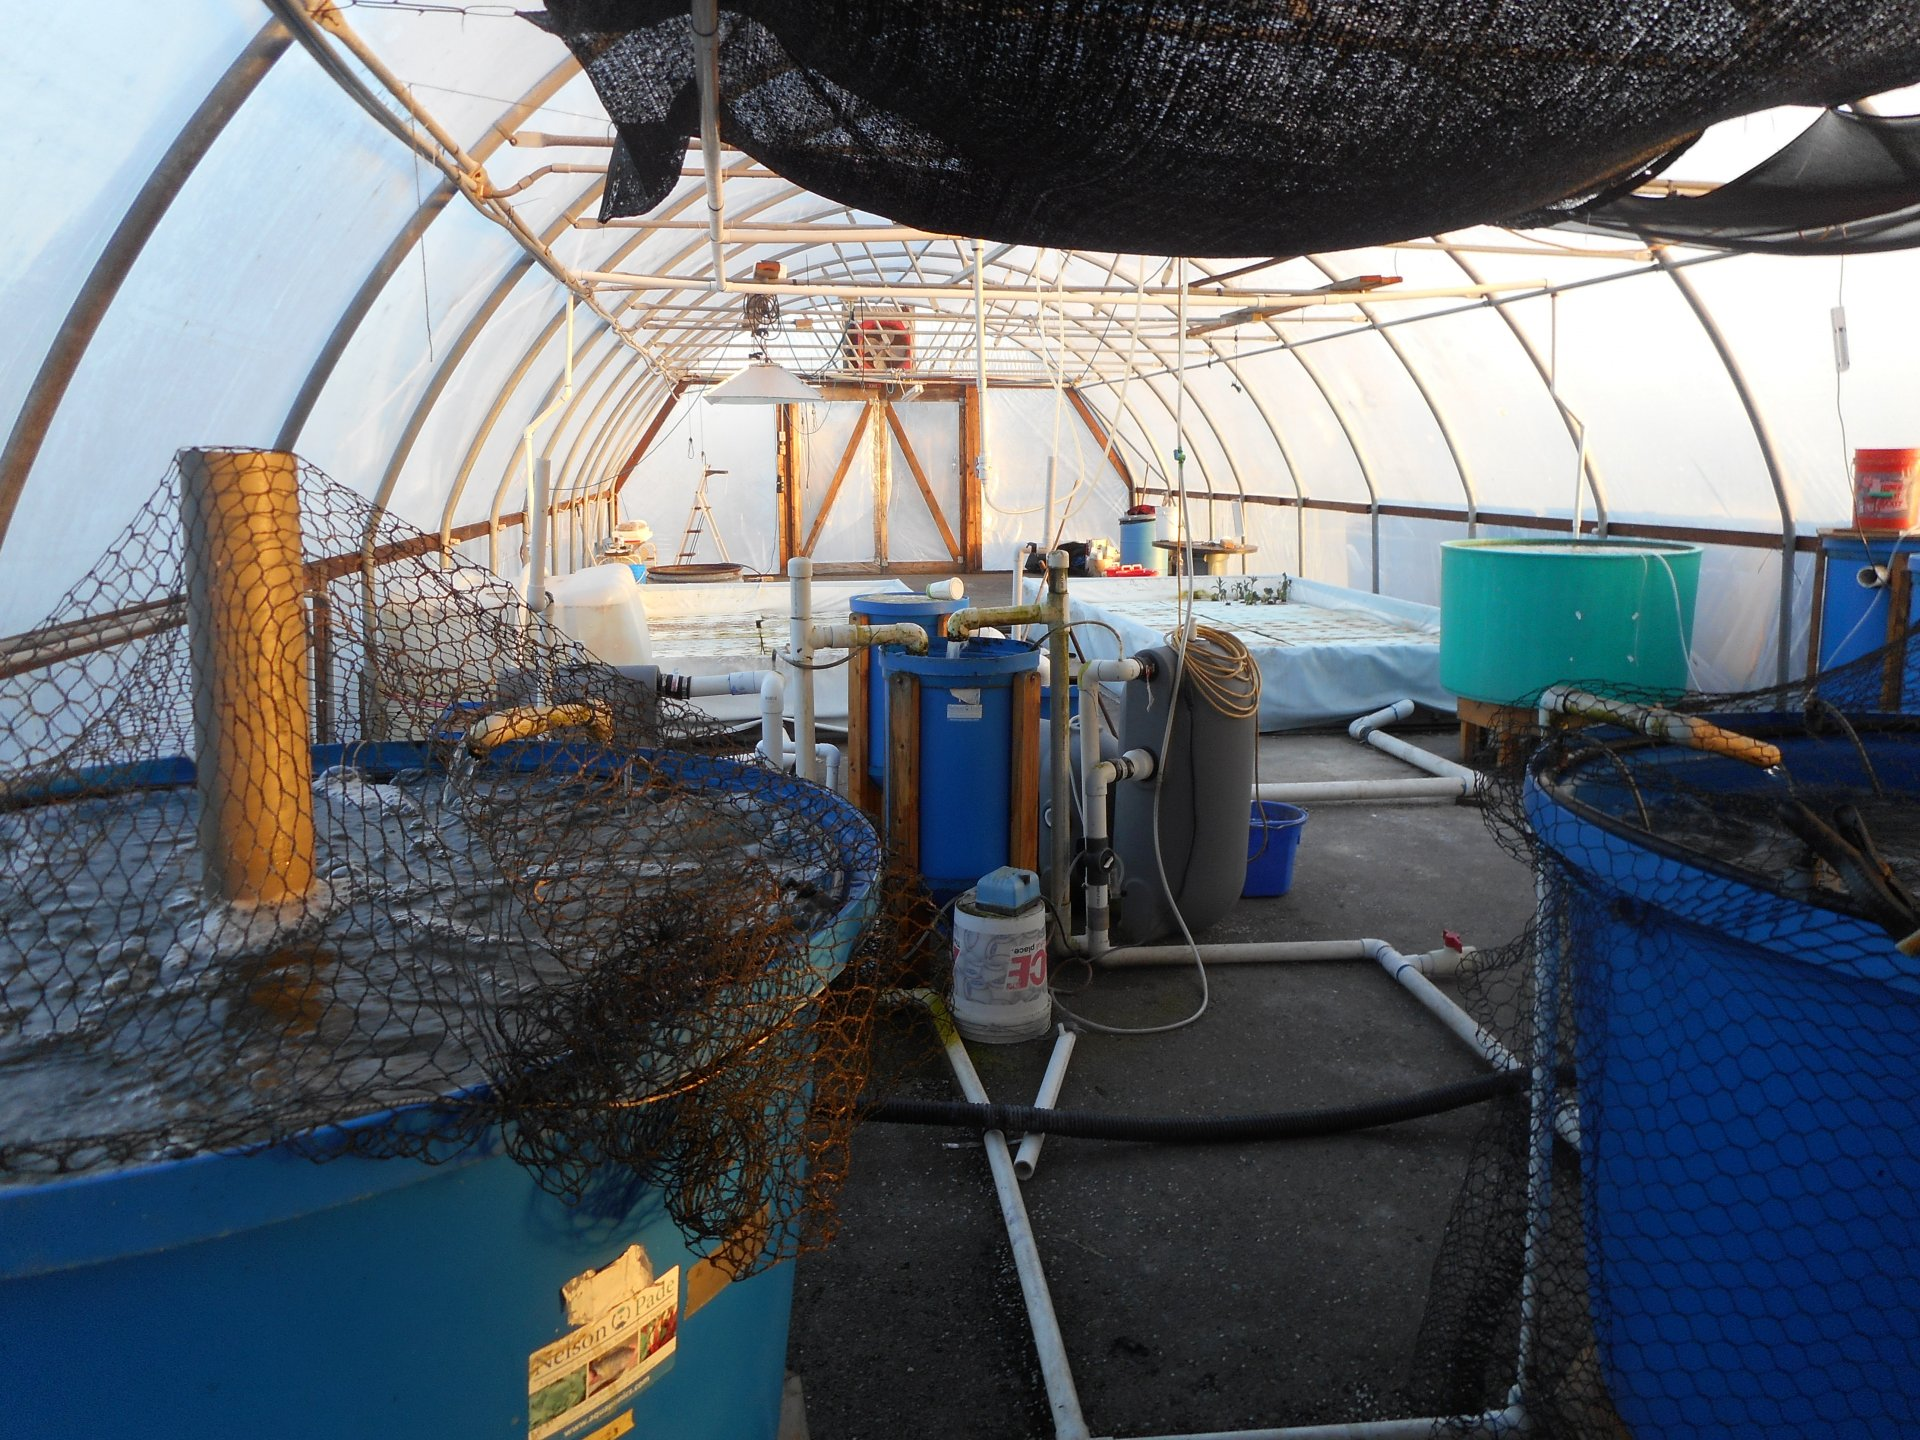 HSU Samoa aquaponics facility preparing to plant a spring garden. Photo by Tyrone McDonald.